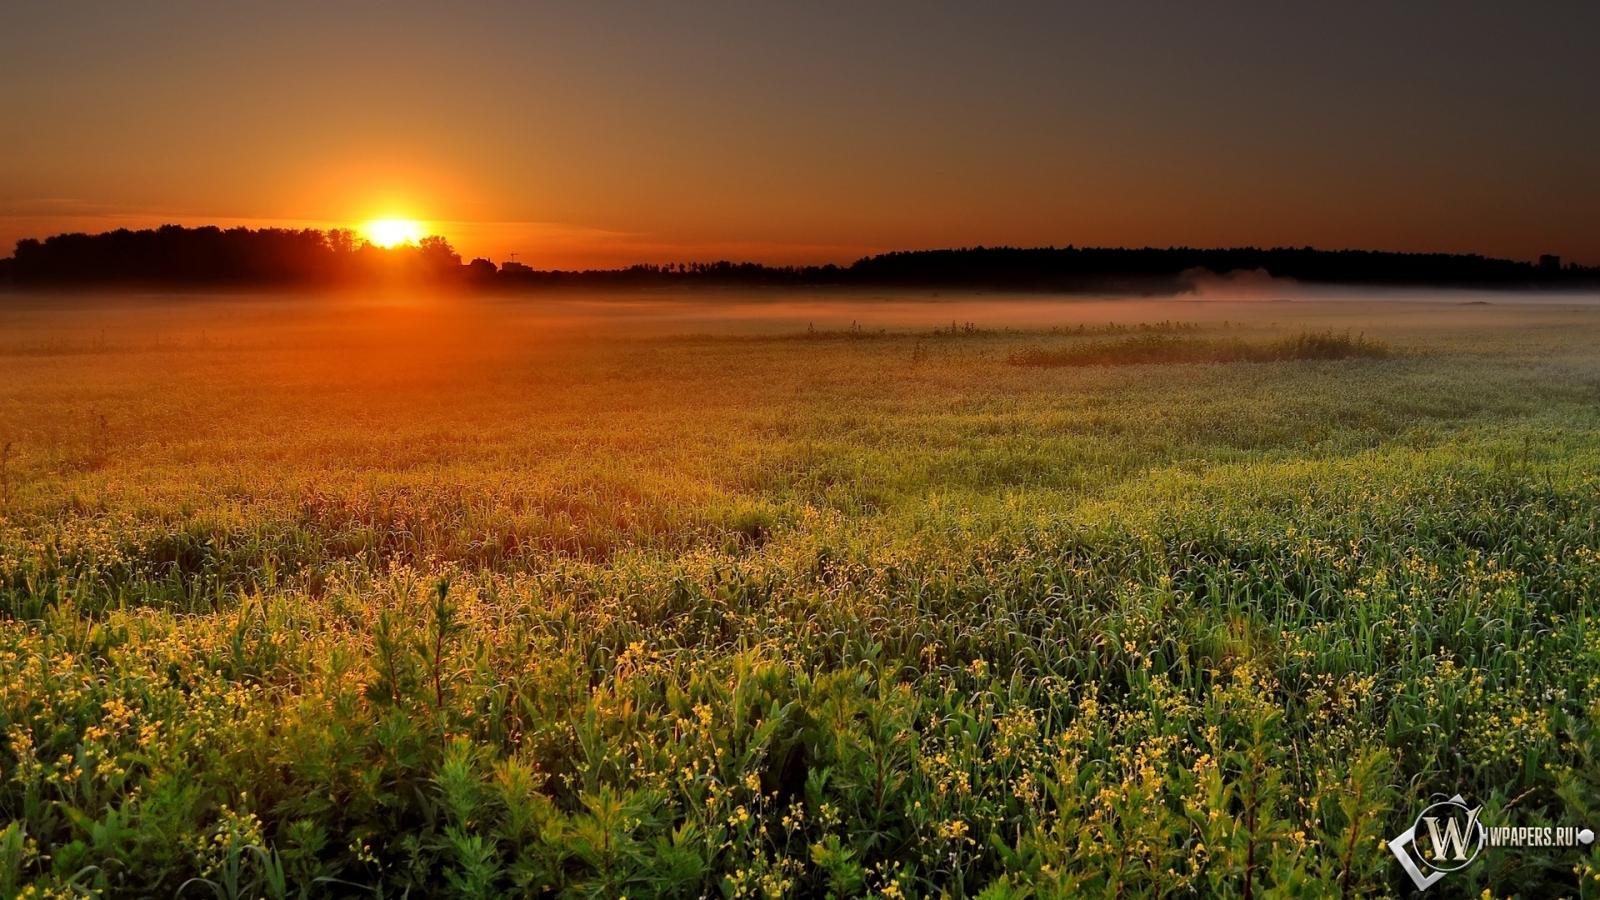 Обои утро природа солнце туман поле